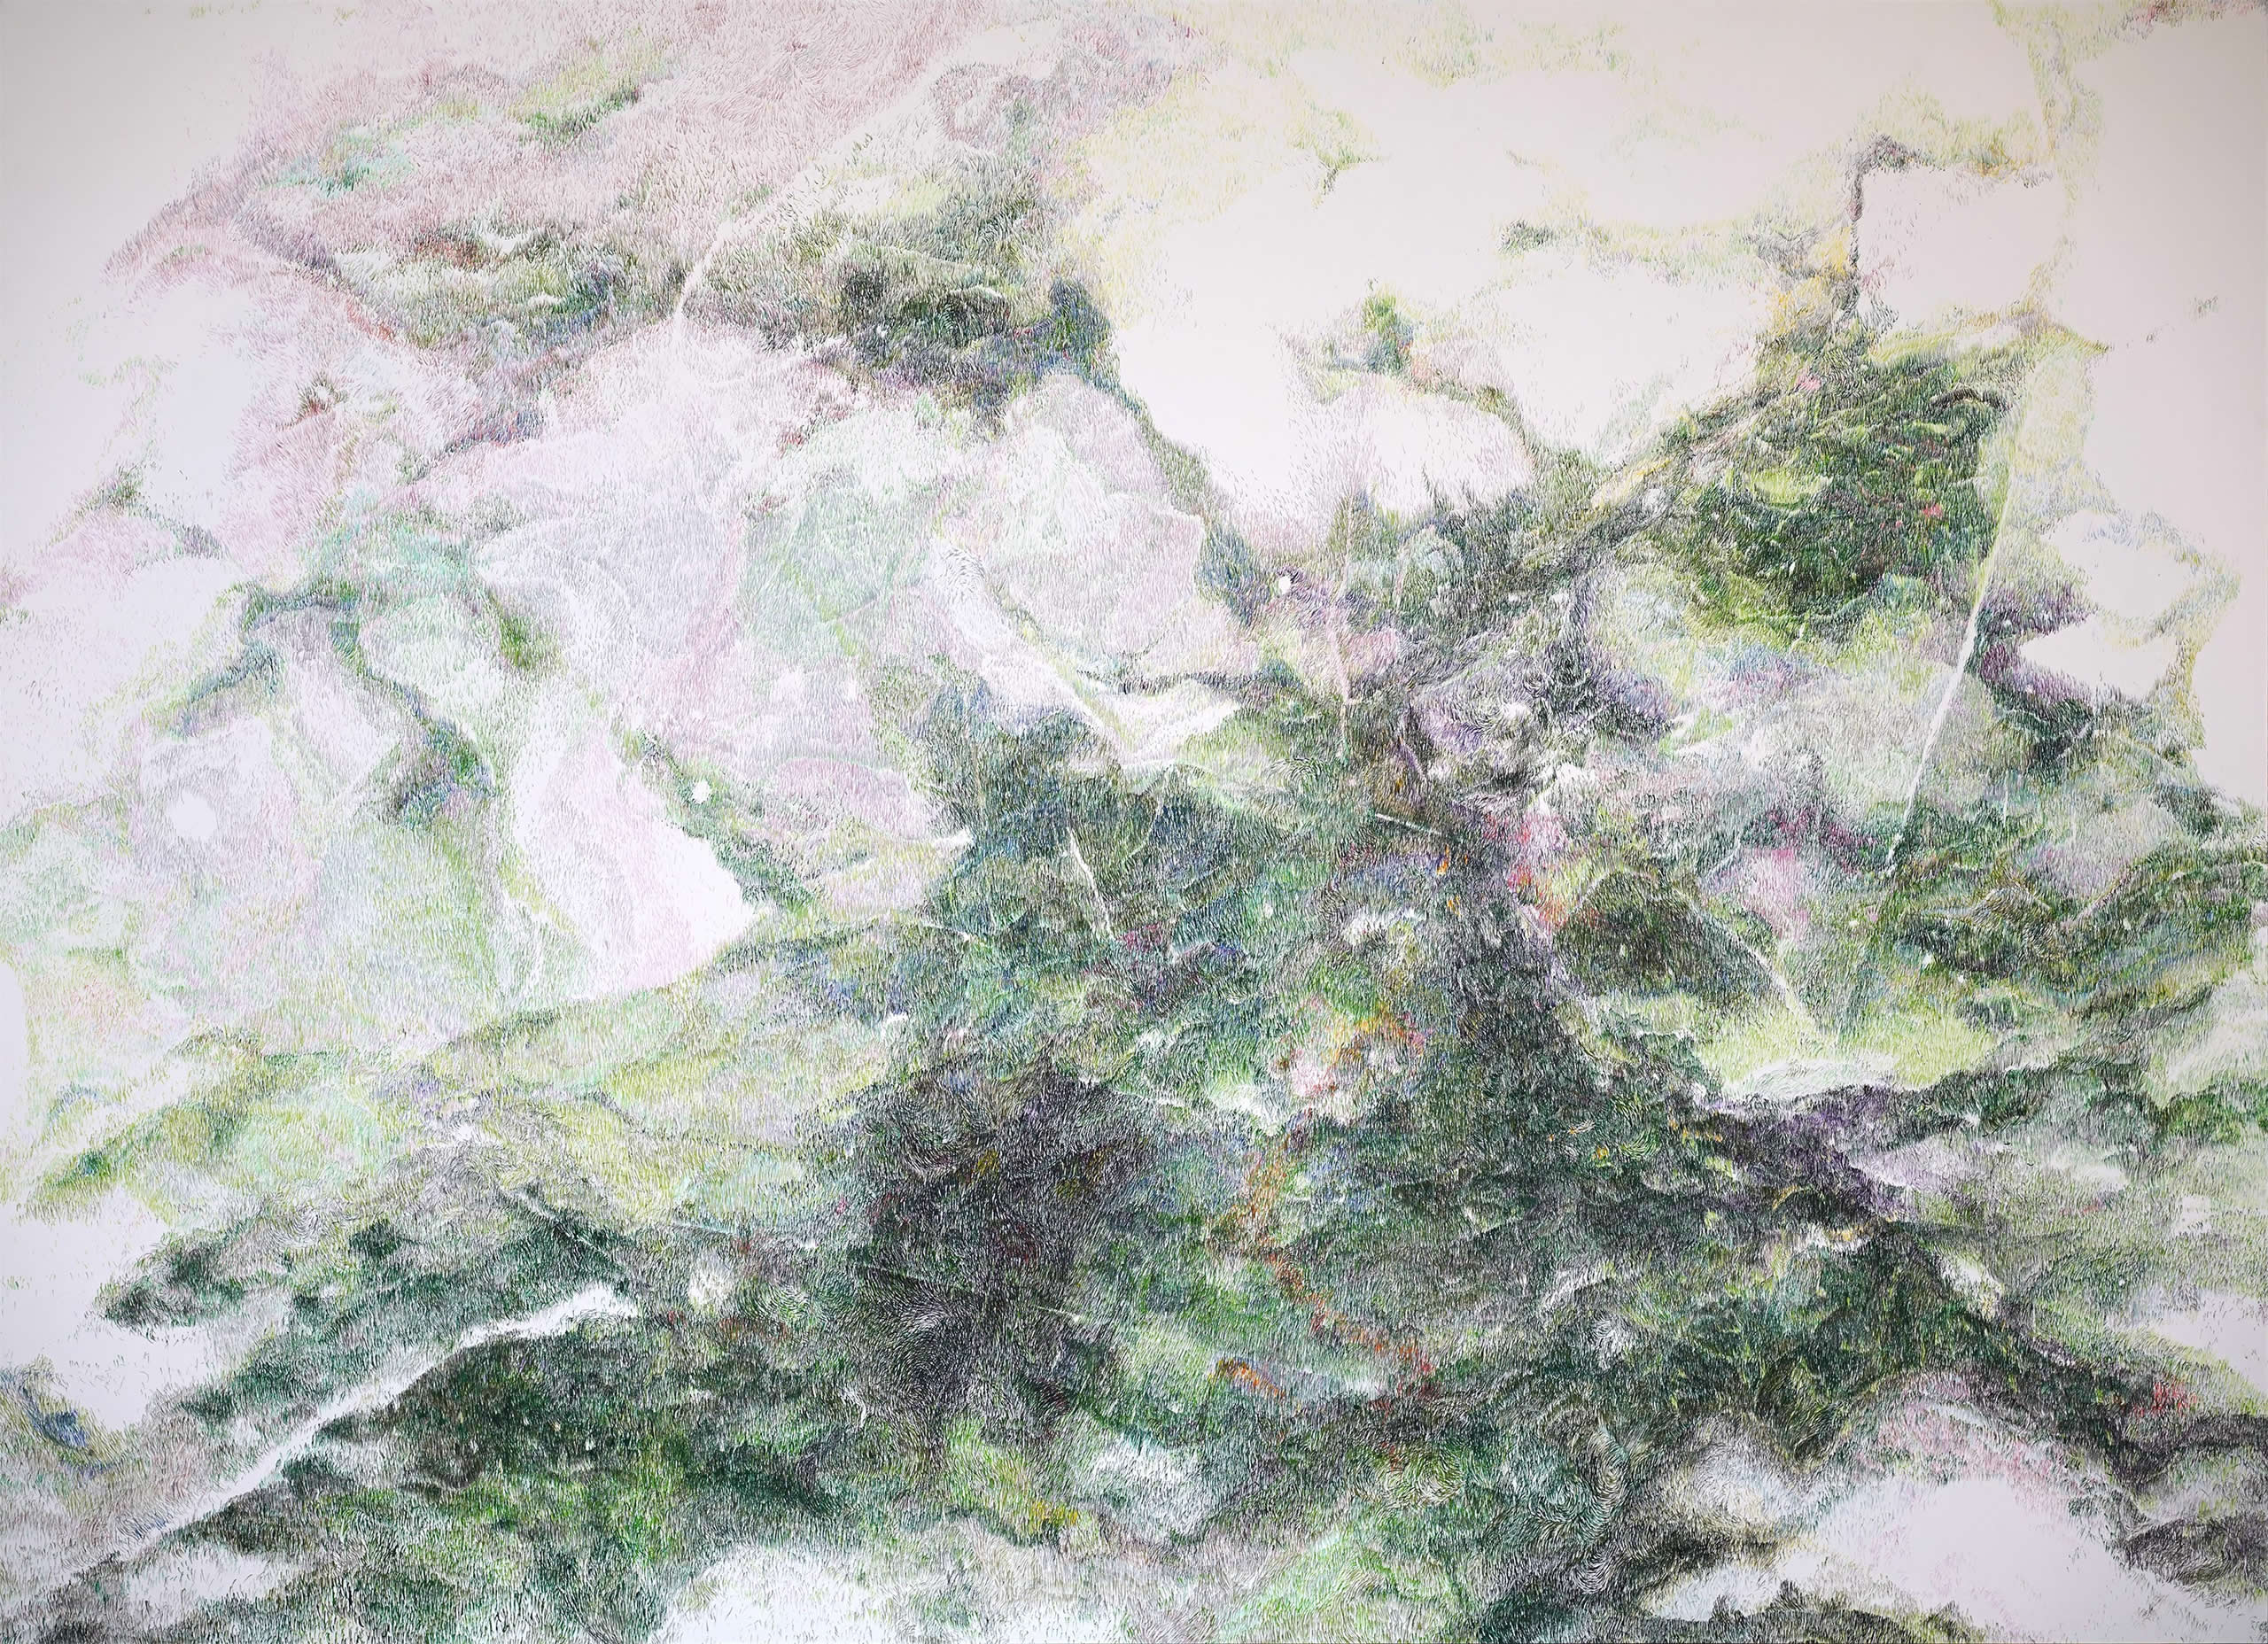 Linda Berger | Grün fact13 | 2018 | Tusche auf Papier | 146x200cm | Art Austia 2019 | Galerie3